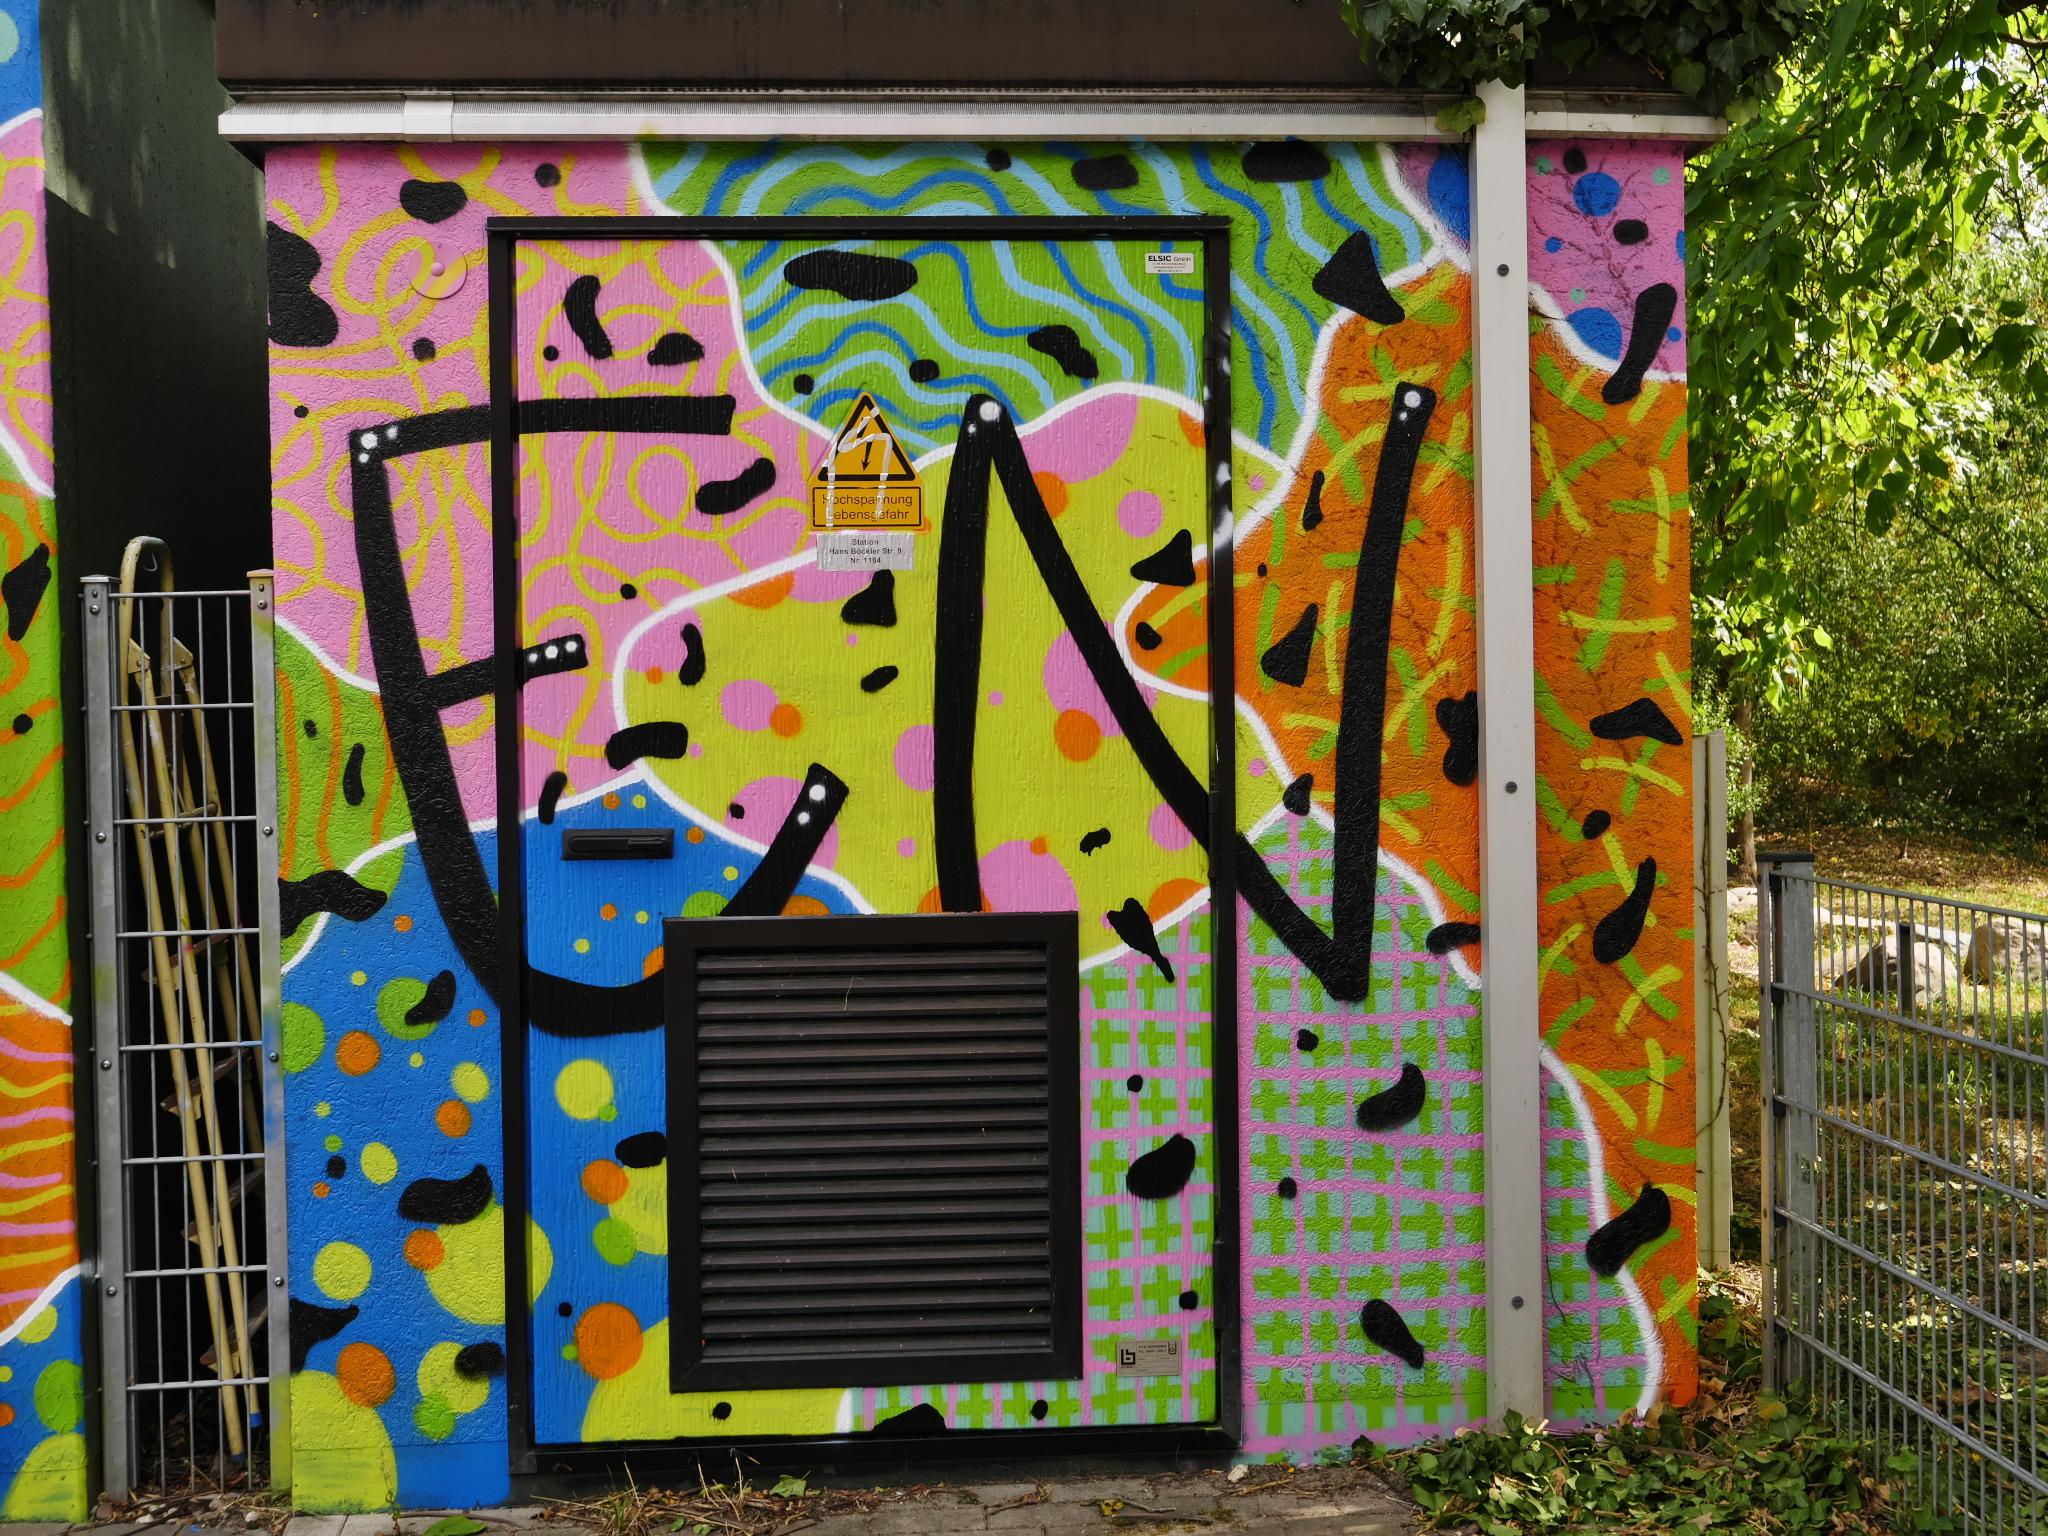 jugendkulturjahr-2020-ratingen-jkj2020-graffiti-trafohaeuschen-stadtwerke-Bild03